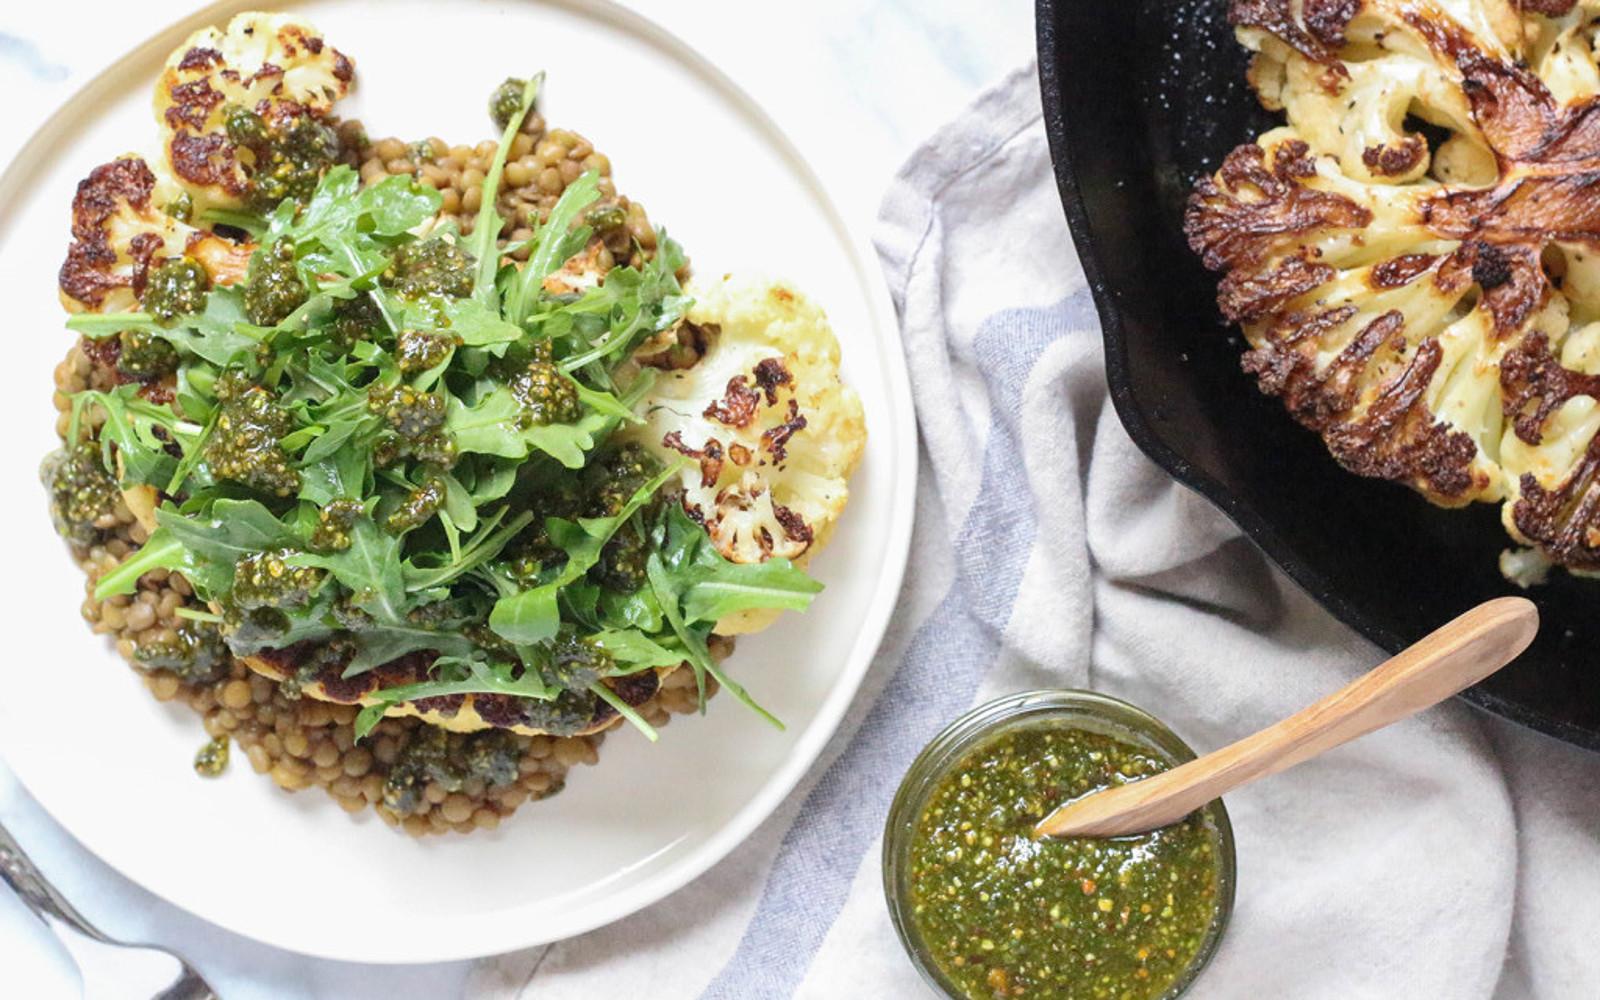 Cauliflower Steaks With Pistachio Mint Pesto